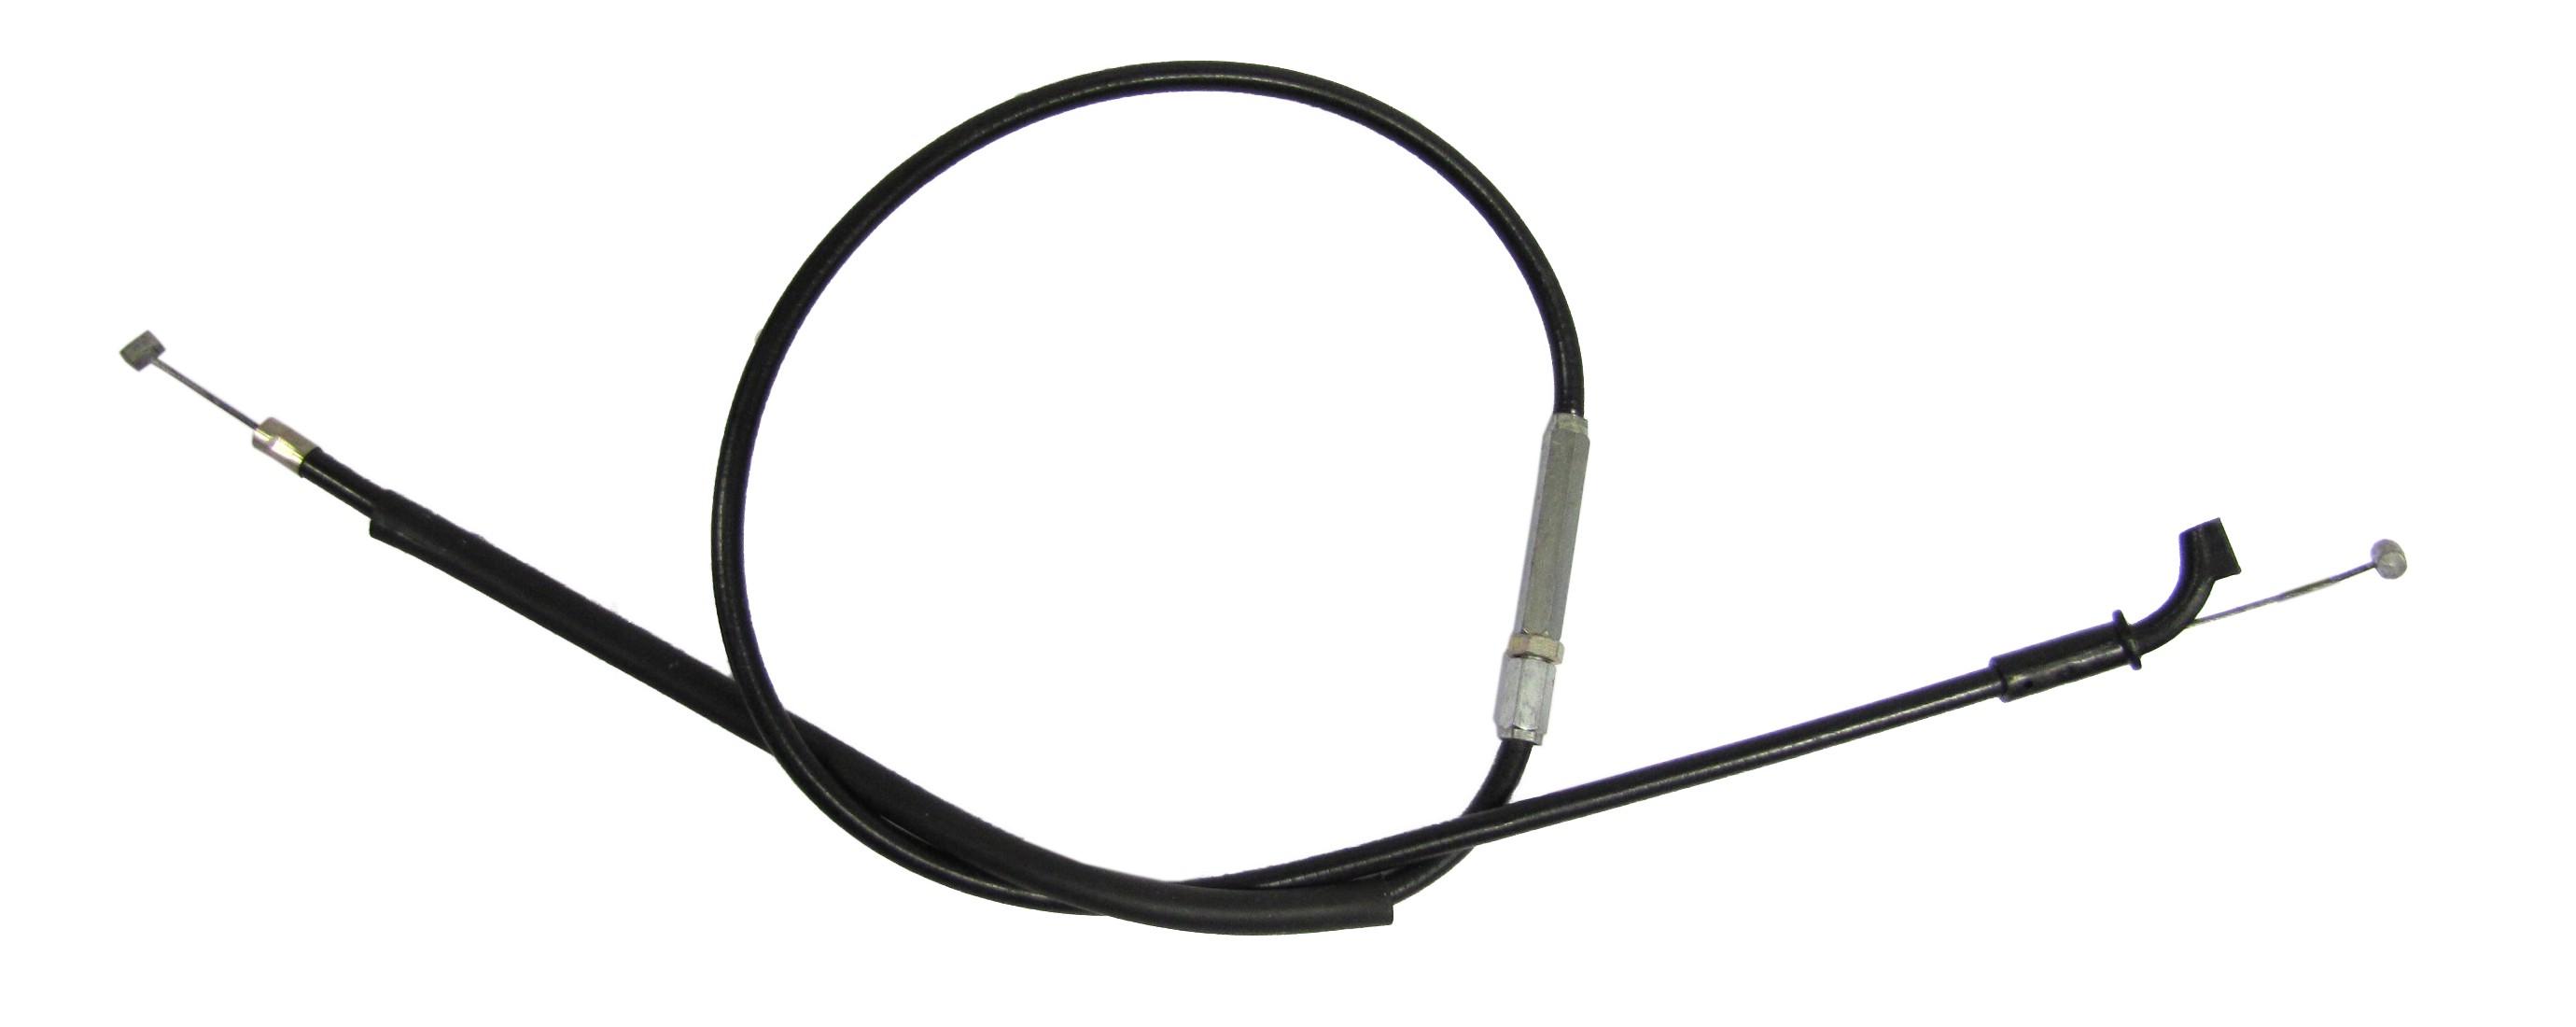 Choke Cable Kawasaki GPZ900R 84-93,4-93,ZRX1200 01-06